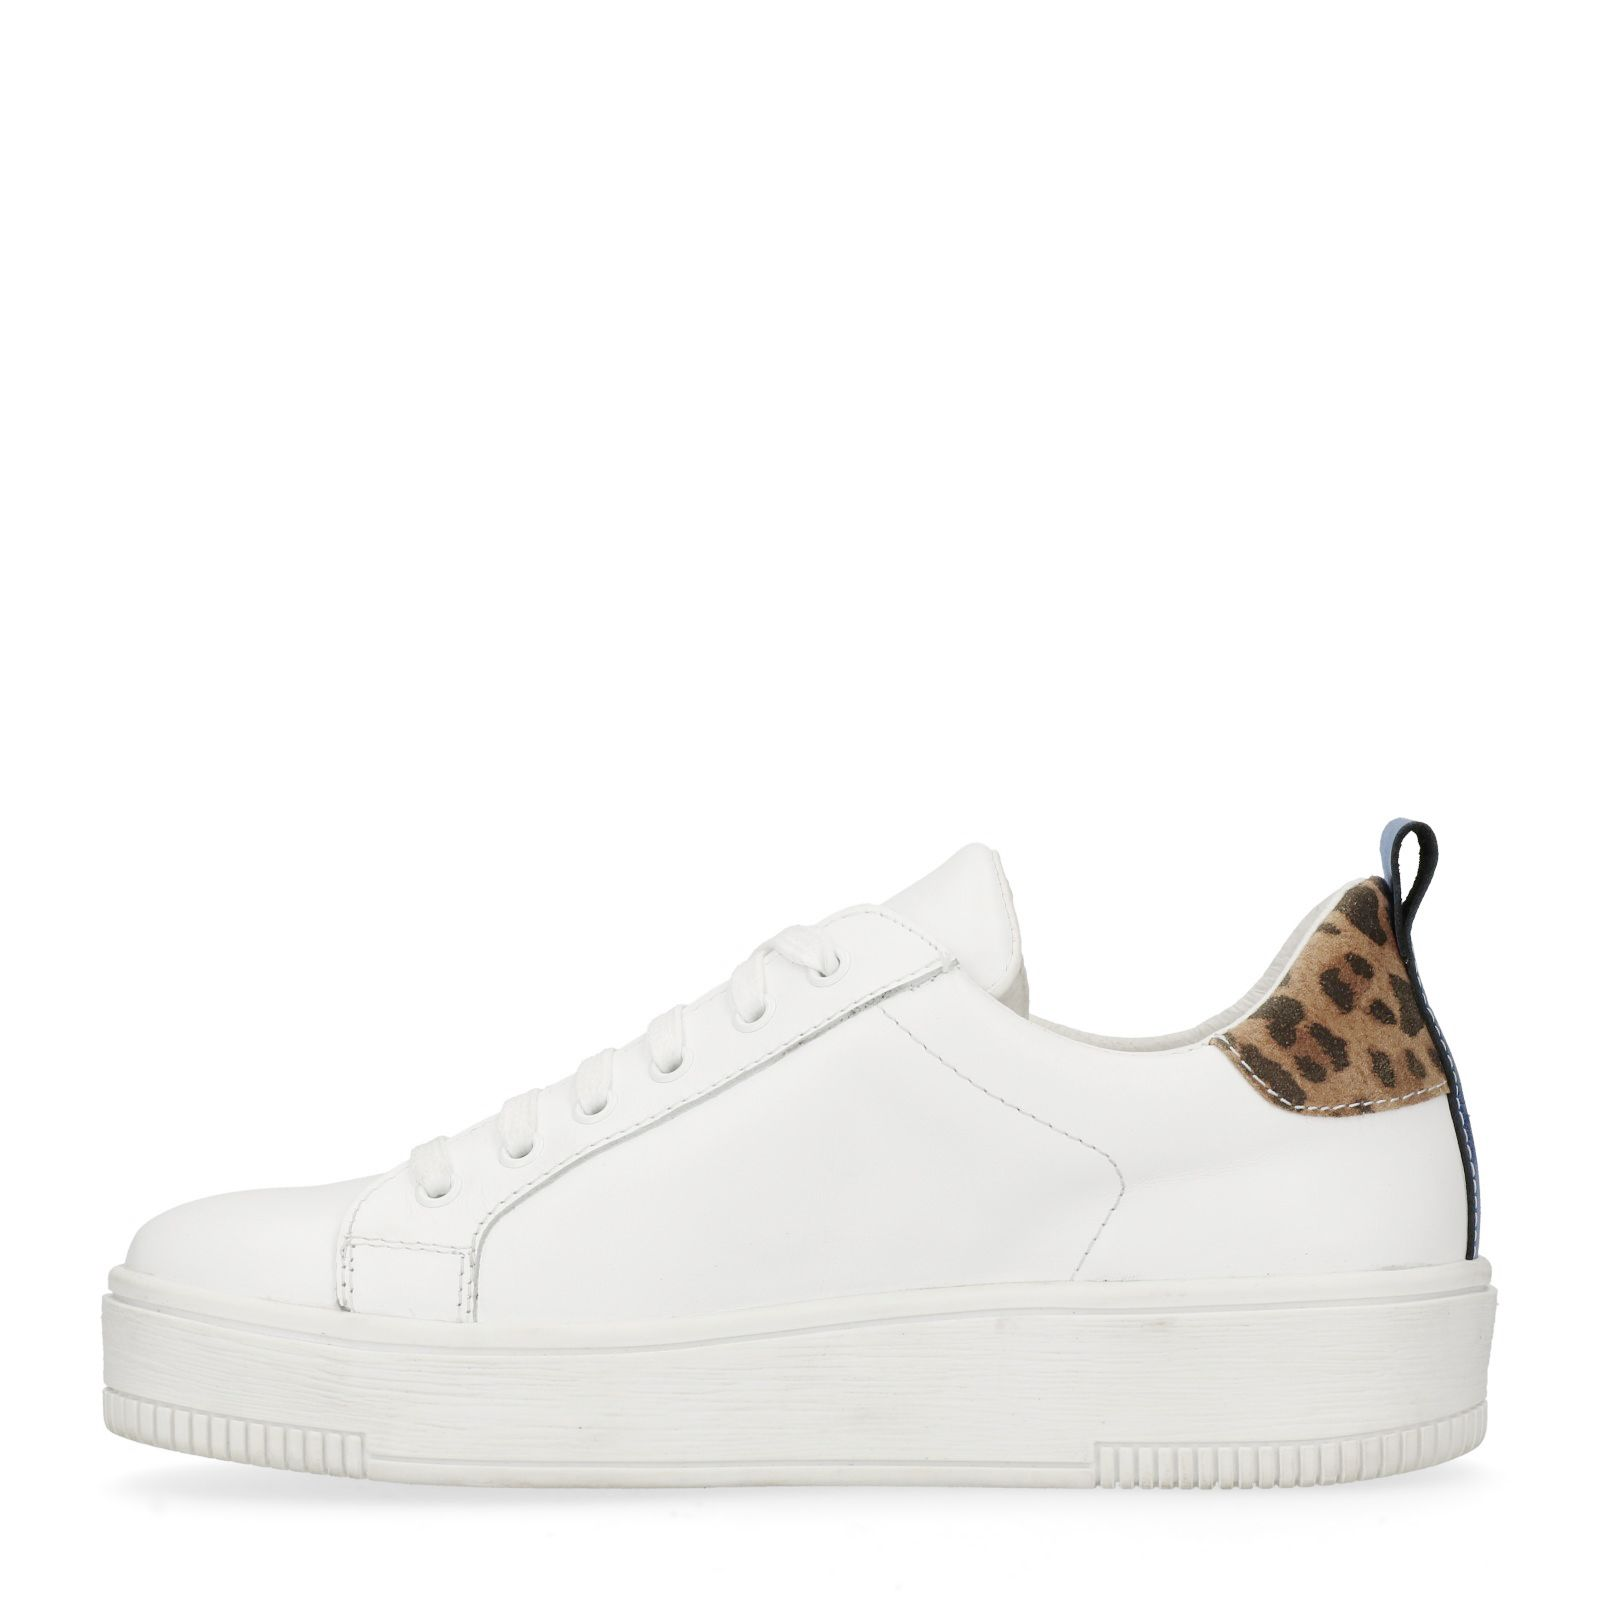 9b86edc053c Witte platform sneakers met panterprint detail - Dames   MANFIELD